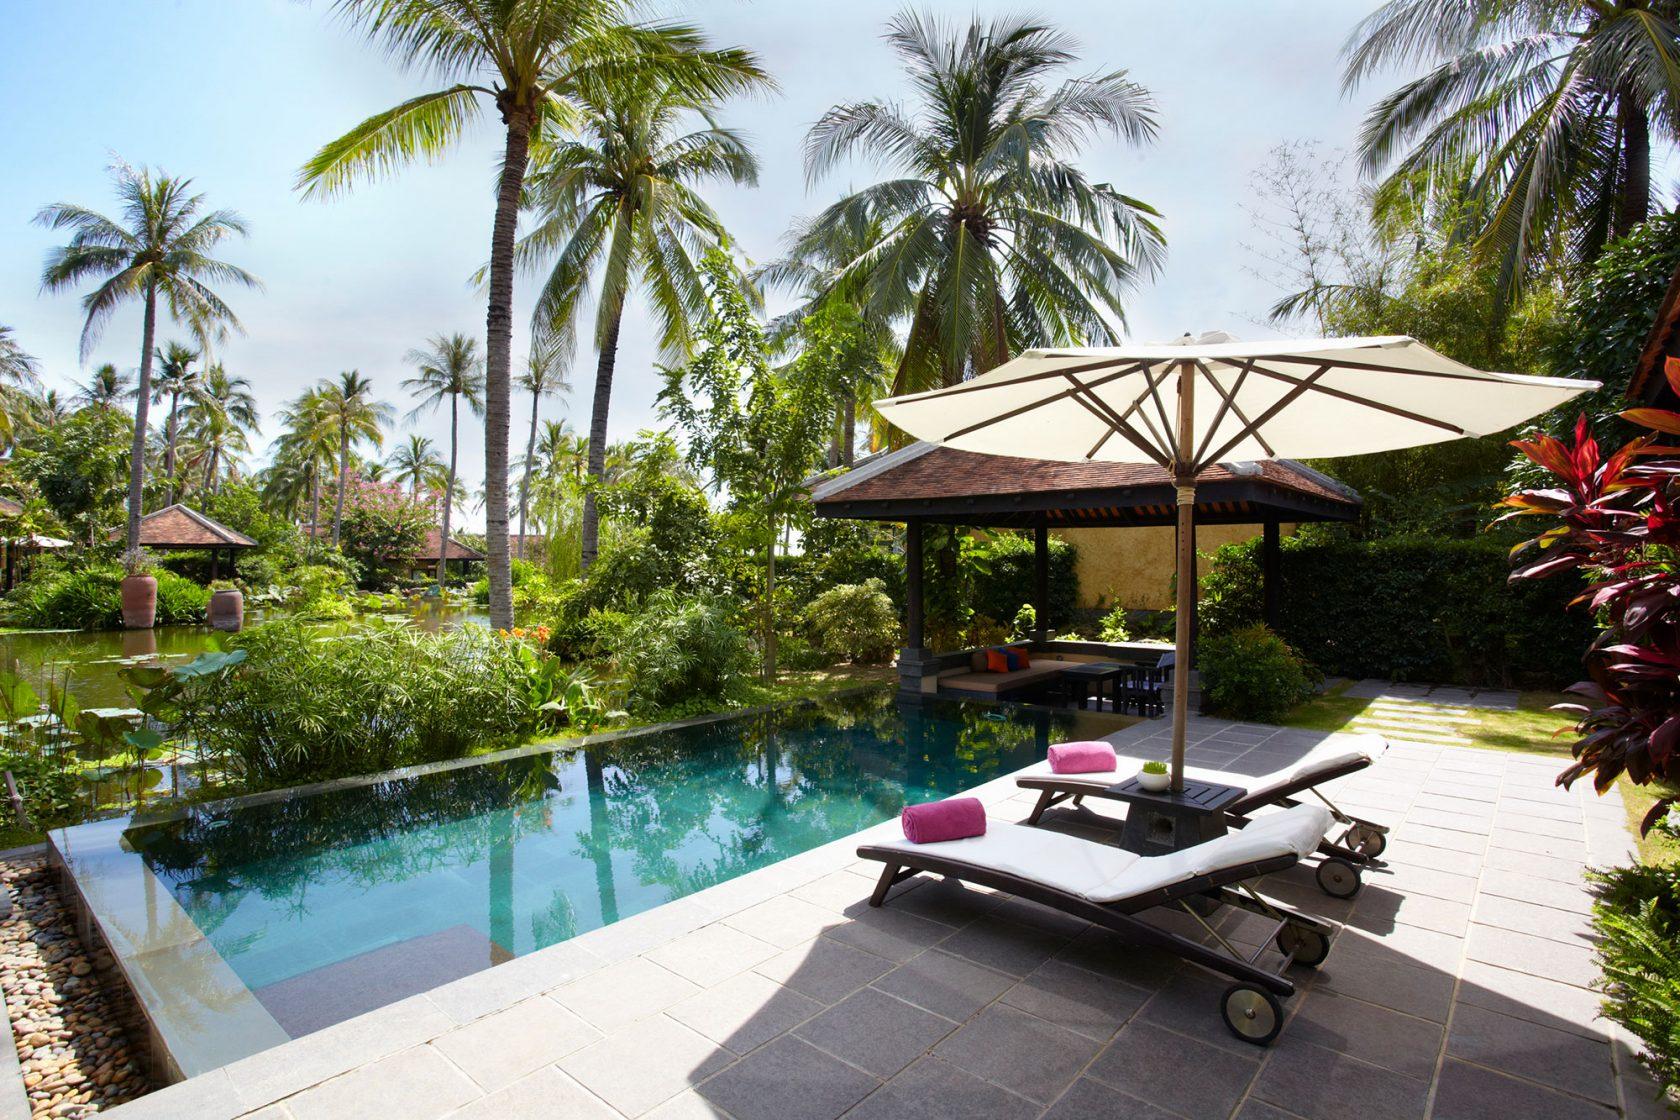 Anantara Mui Ne Private Pool Villa